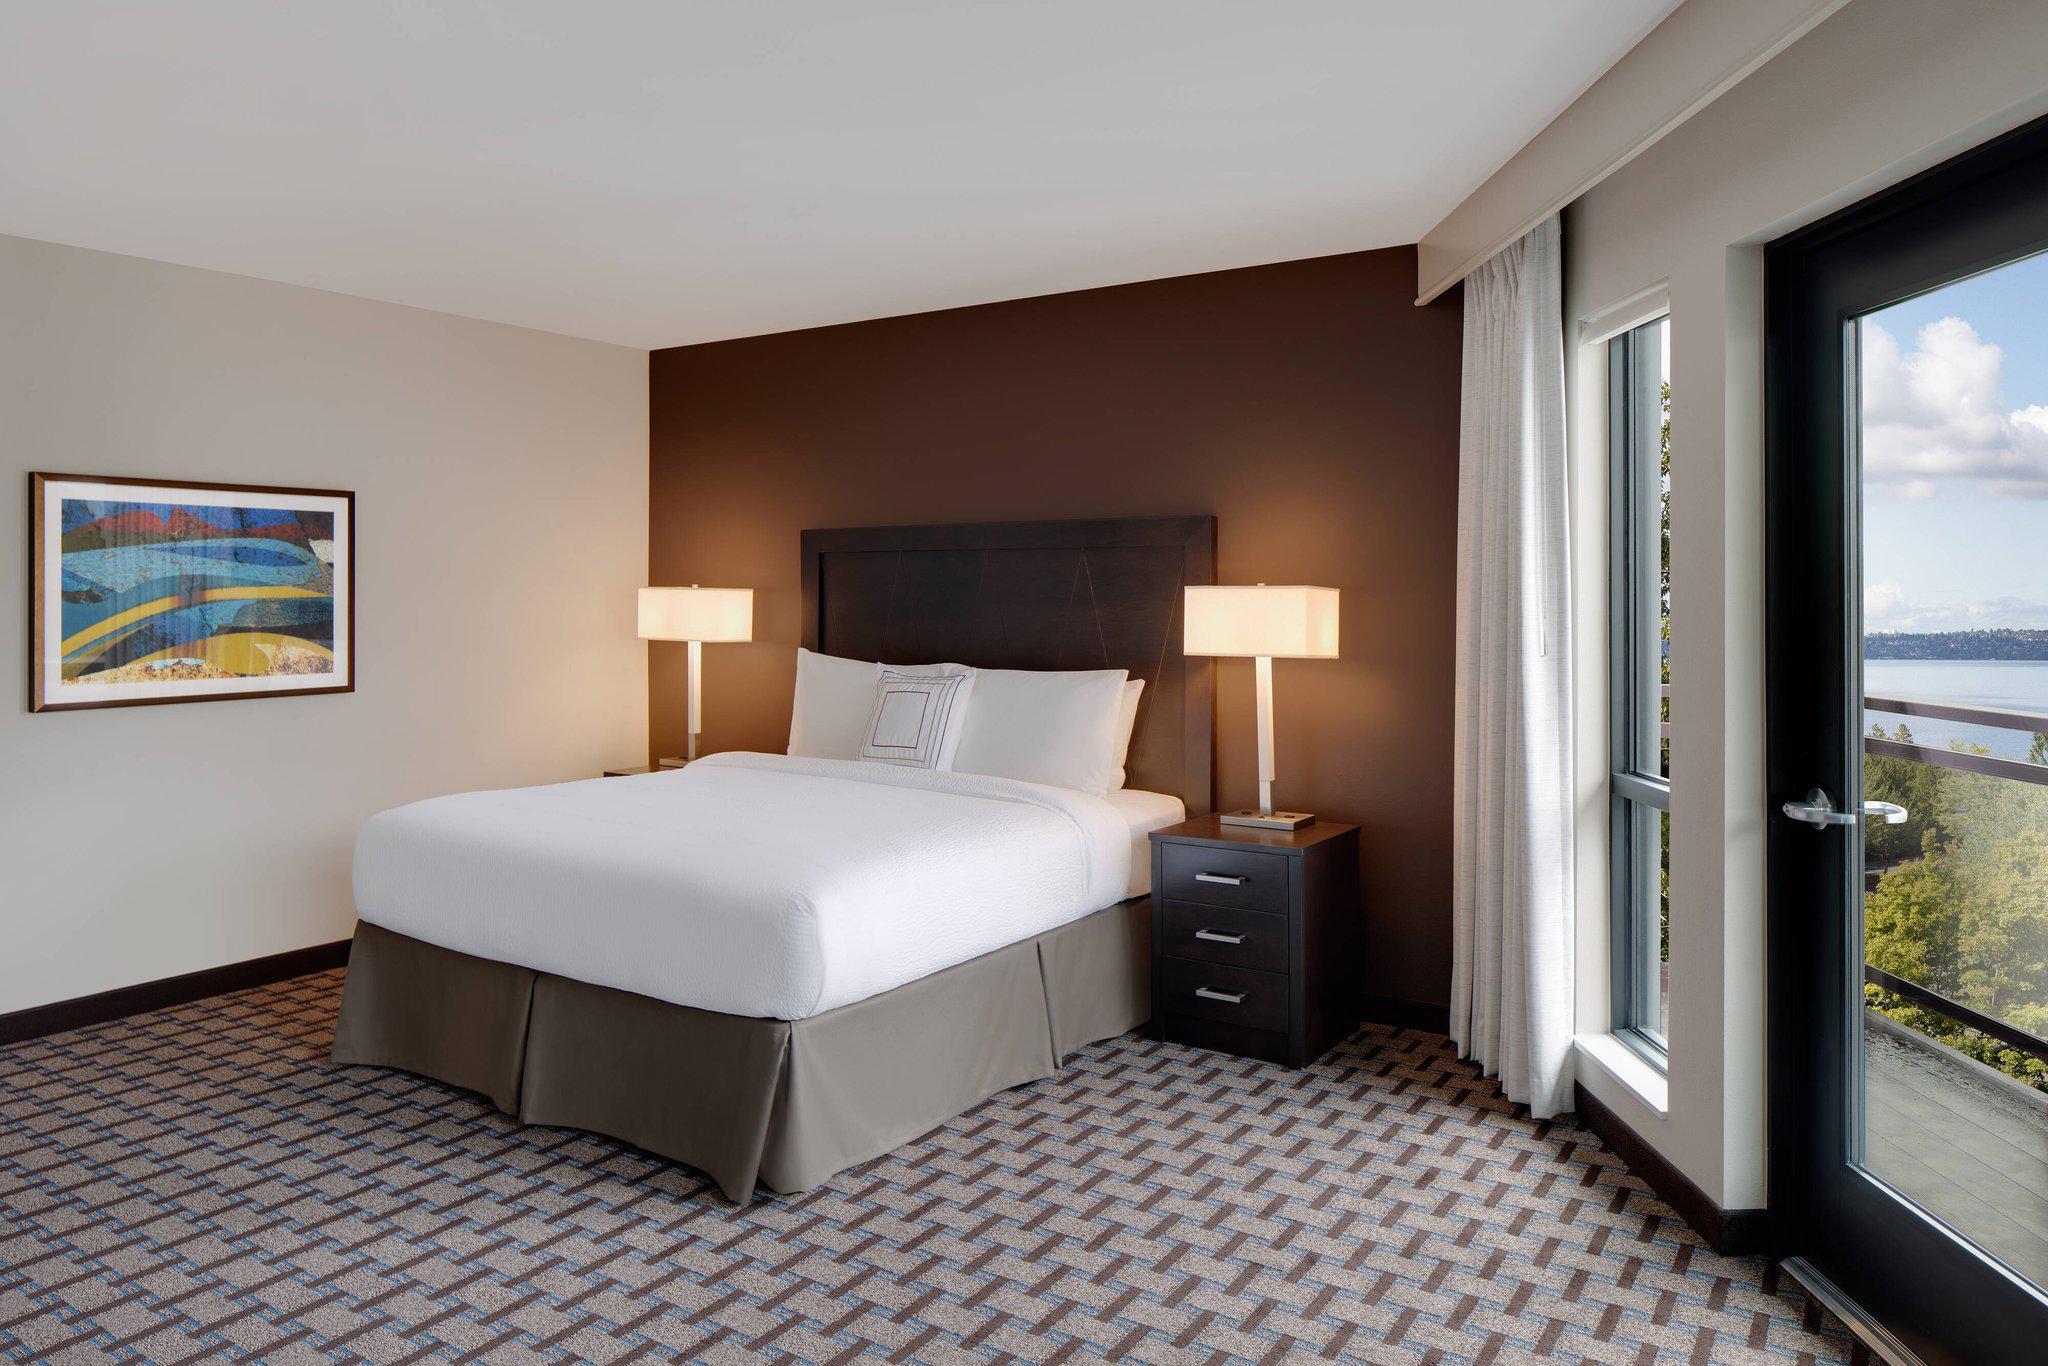 Residence Inn by Marriott Seattle South/Renton